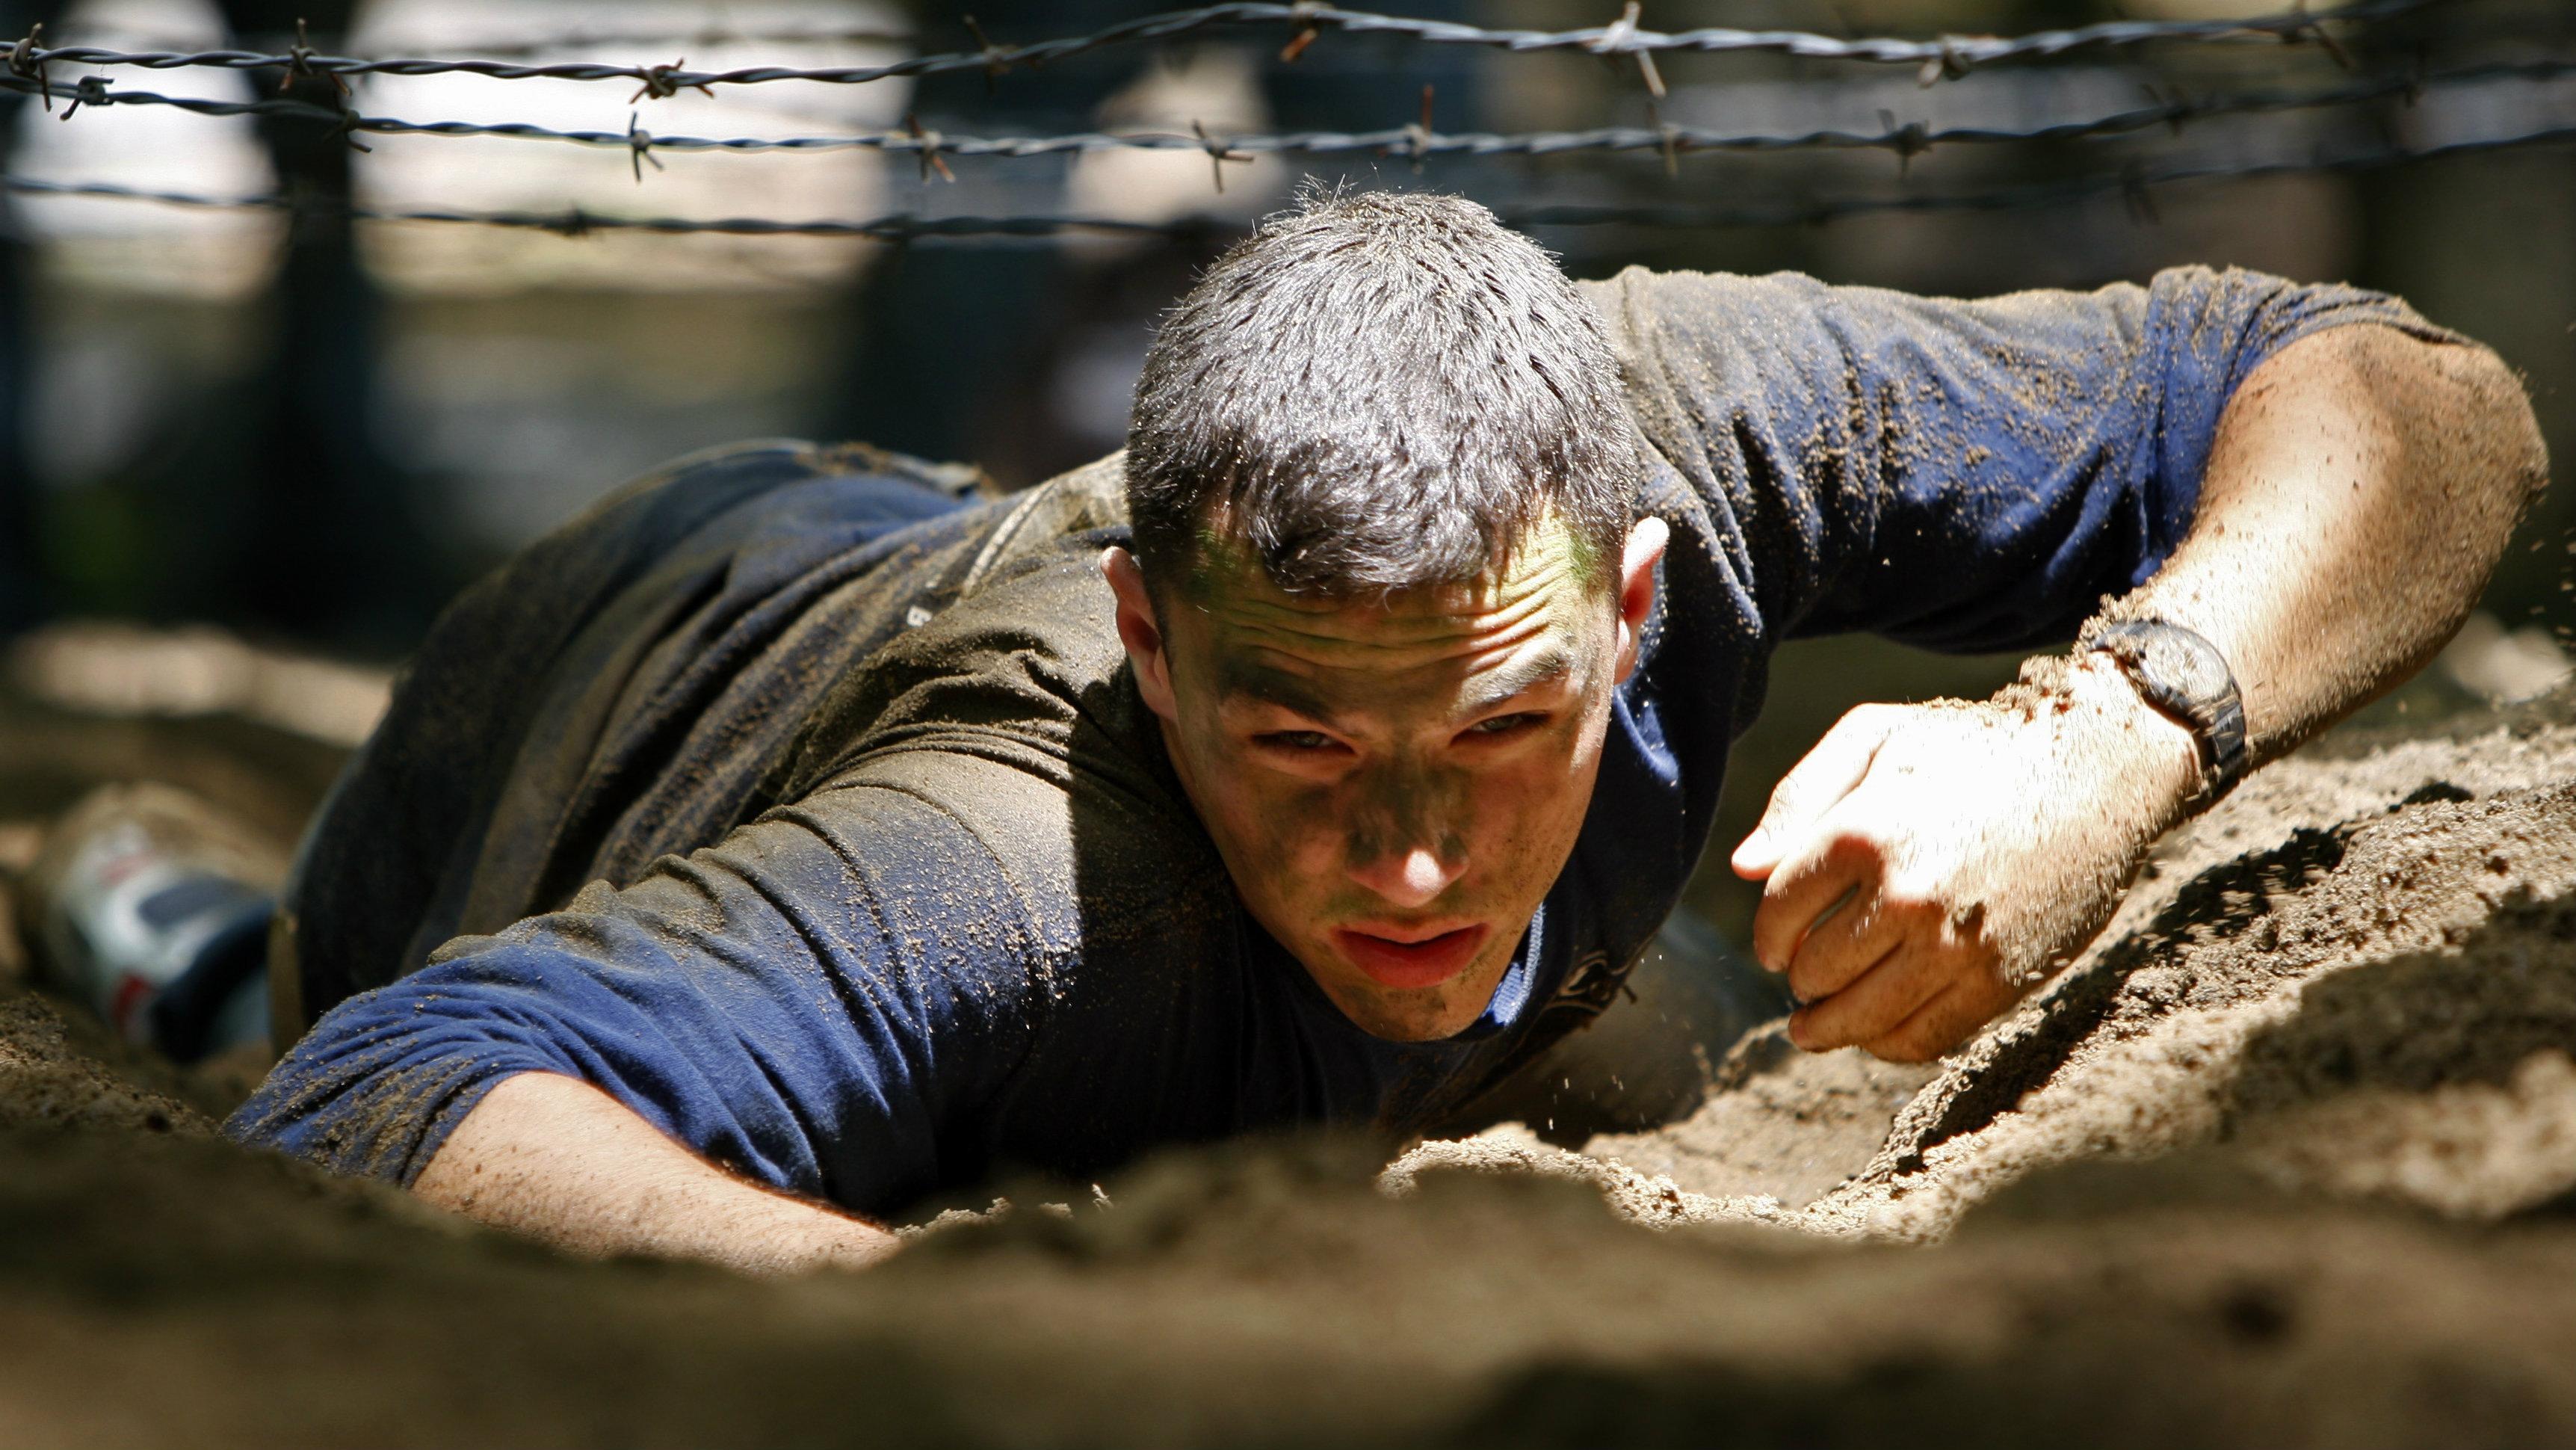 man crawling in mud